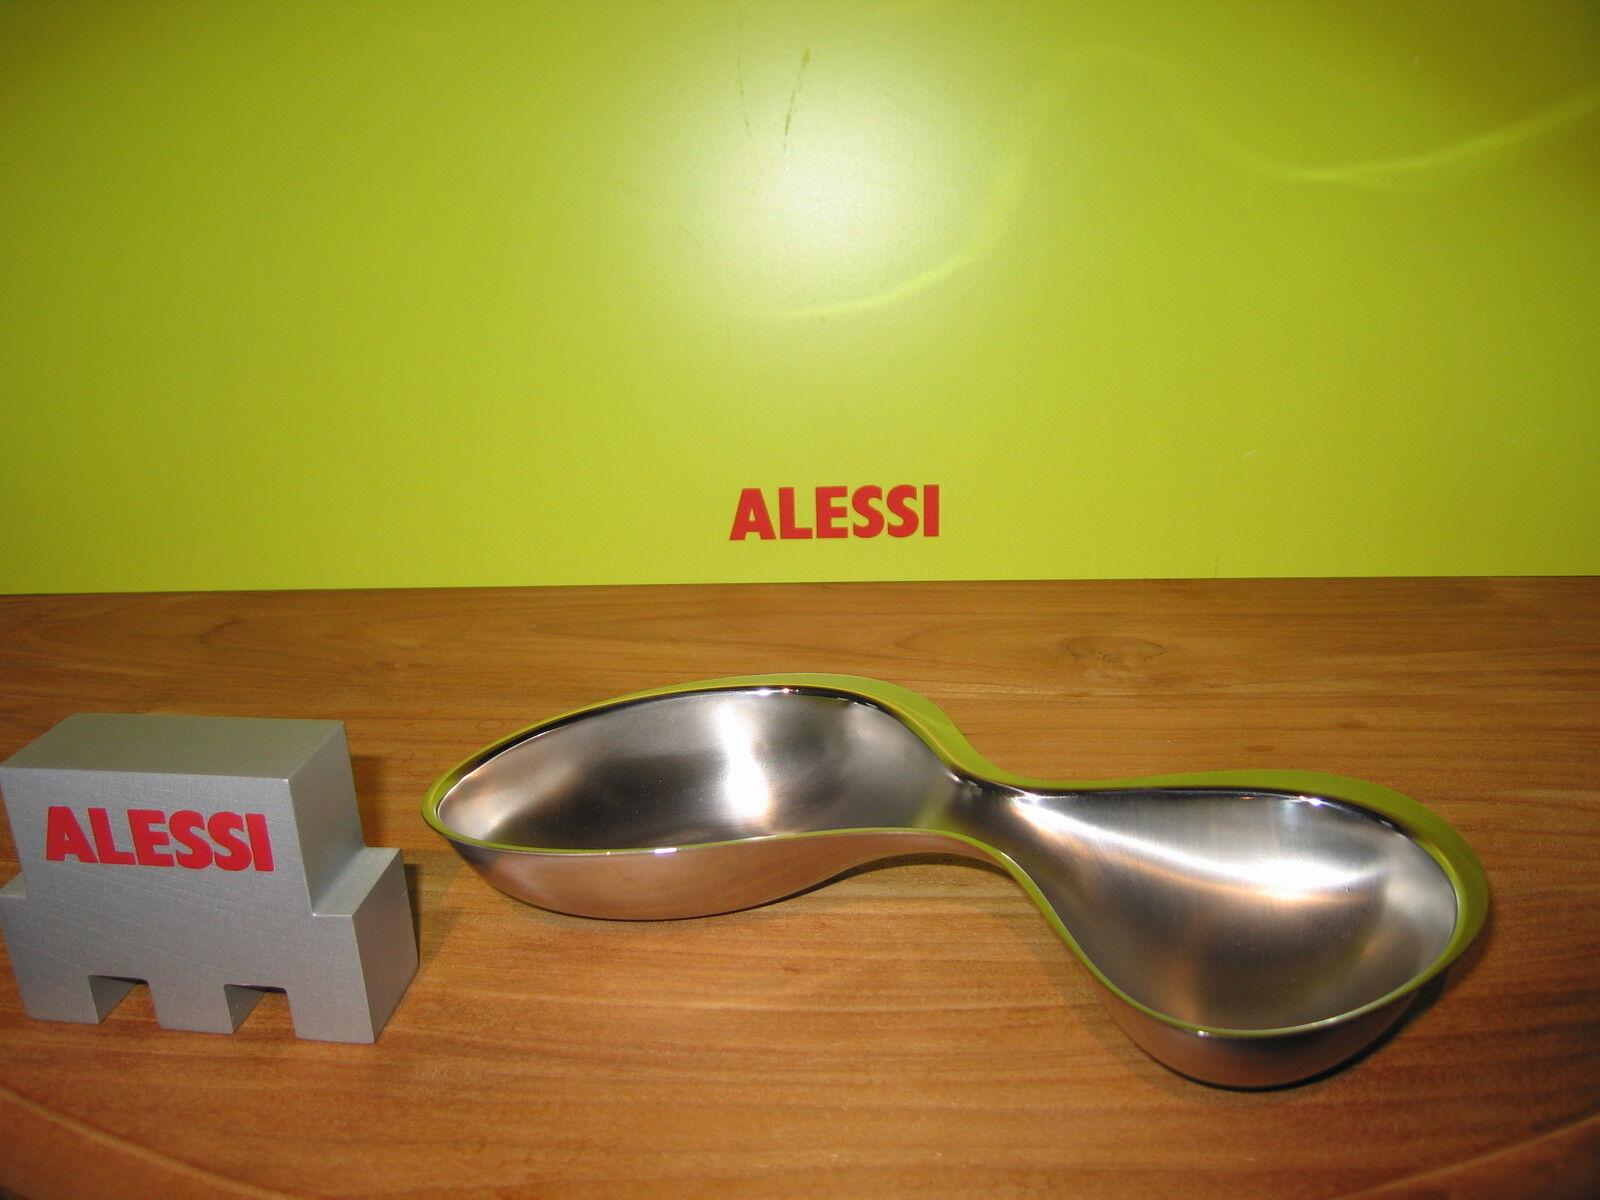 ALESSI NEW Plat hors d'oeuvre inox satiné bord brillant 23x19,5cm H.4cm RA02